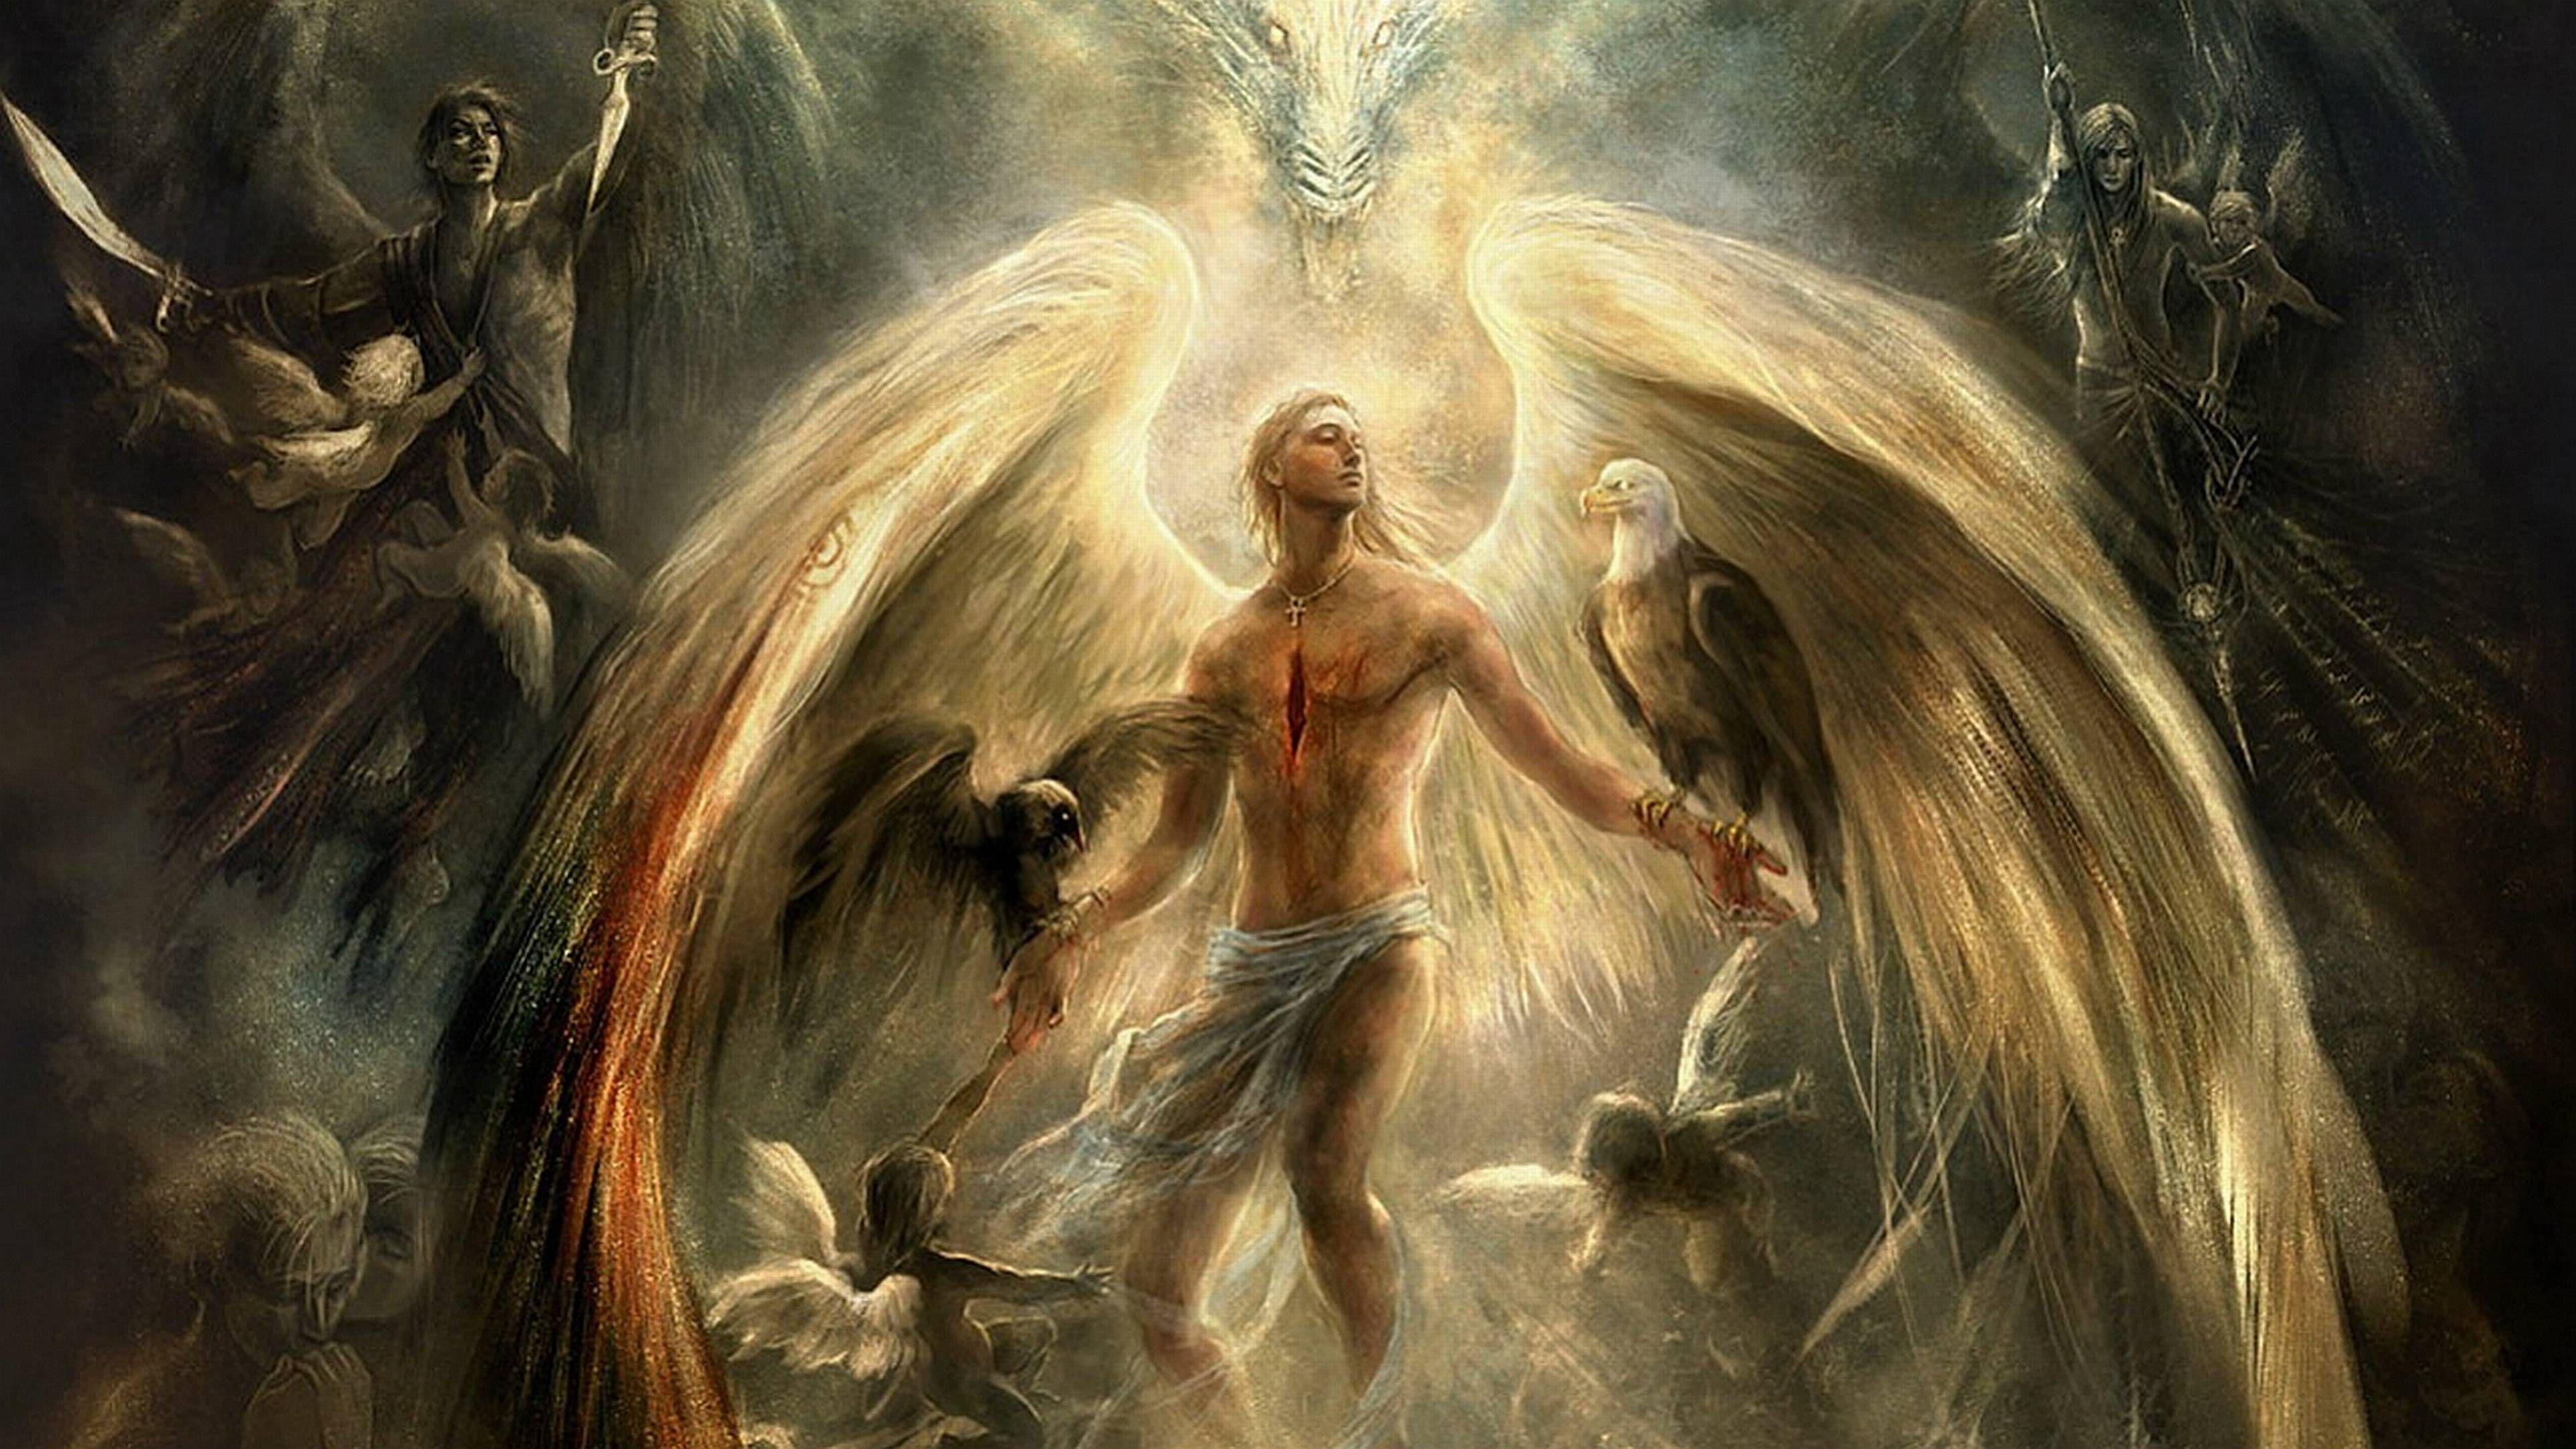 Wallpapers Of Angels Wallpaper Cave Engel